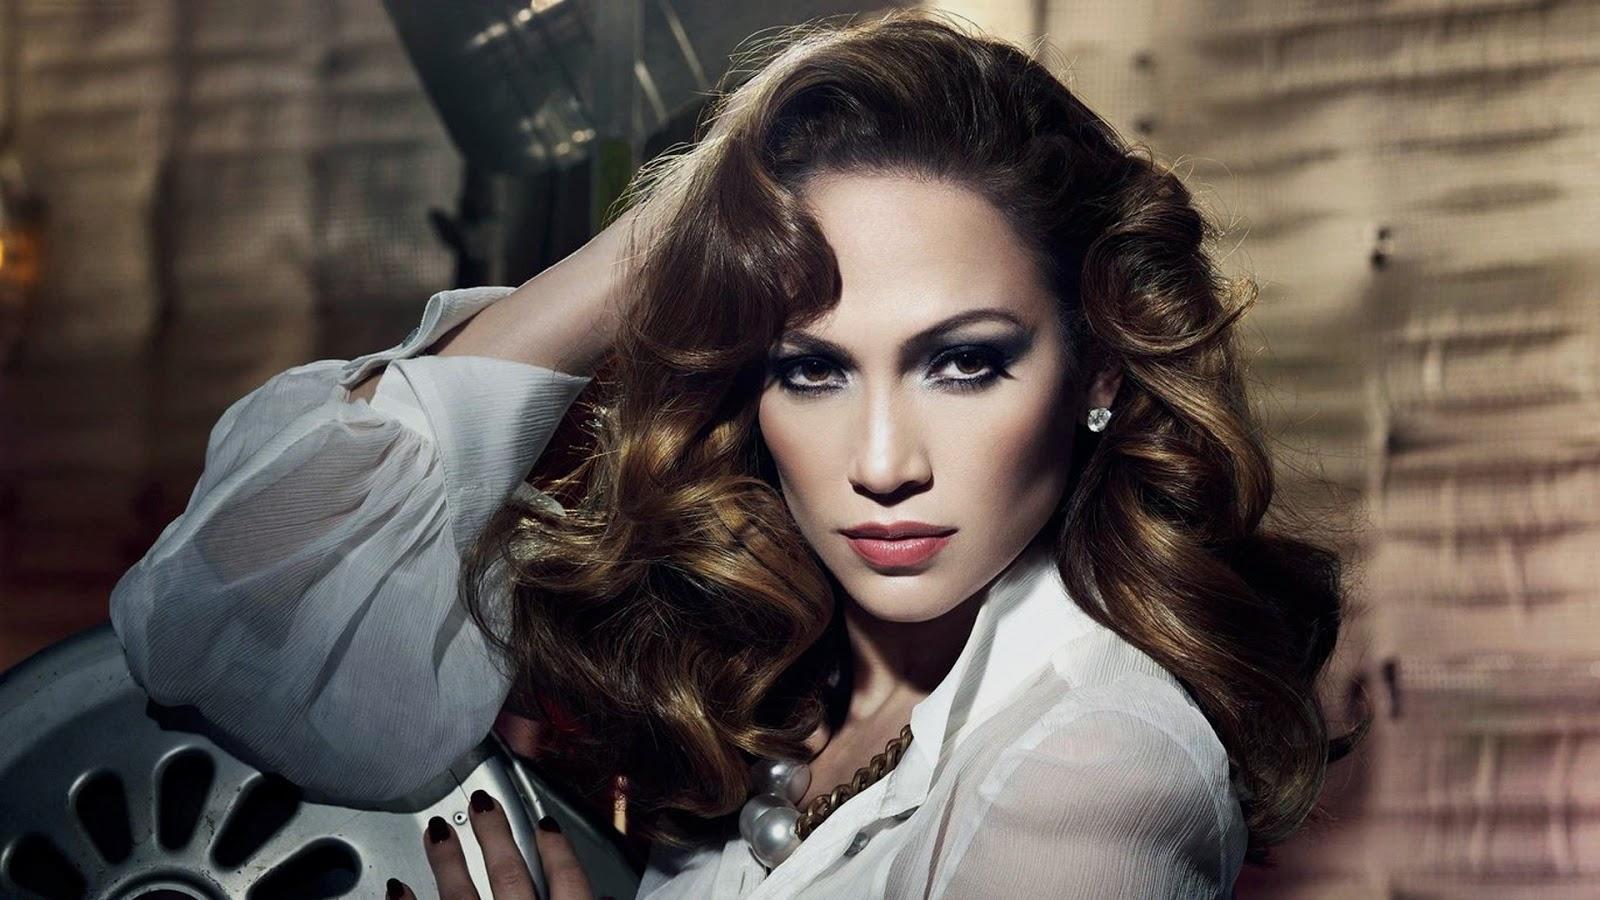 Wallpaper Collections Jennifer Lopez HD Wallpapers 1600x900